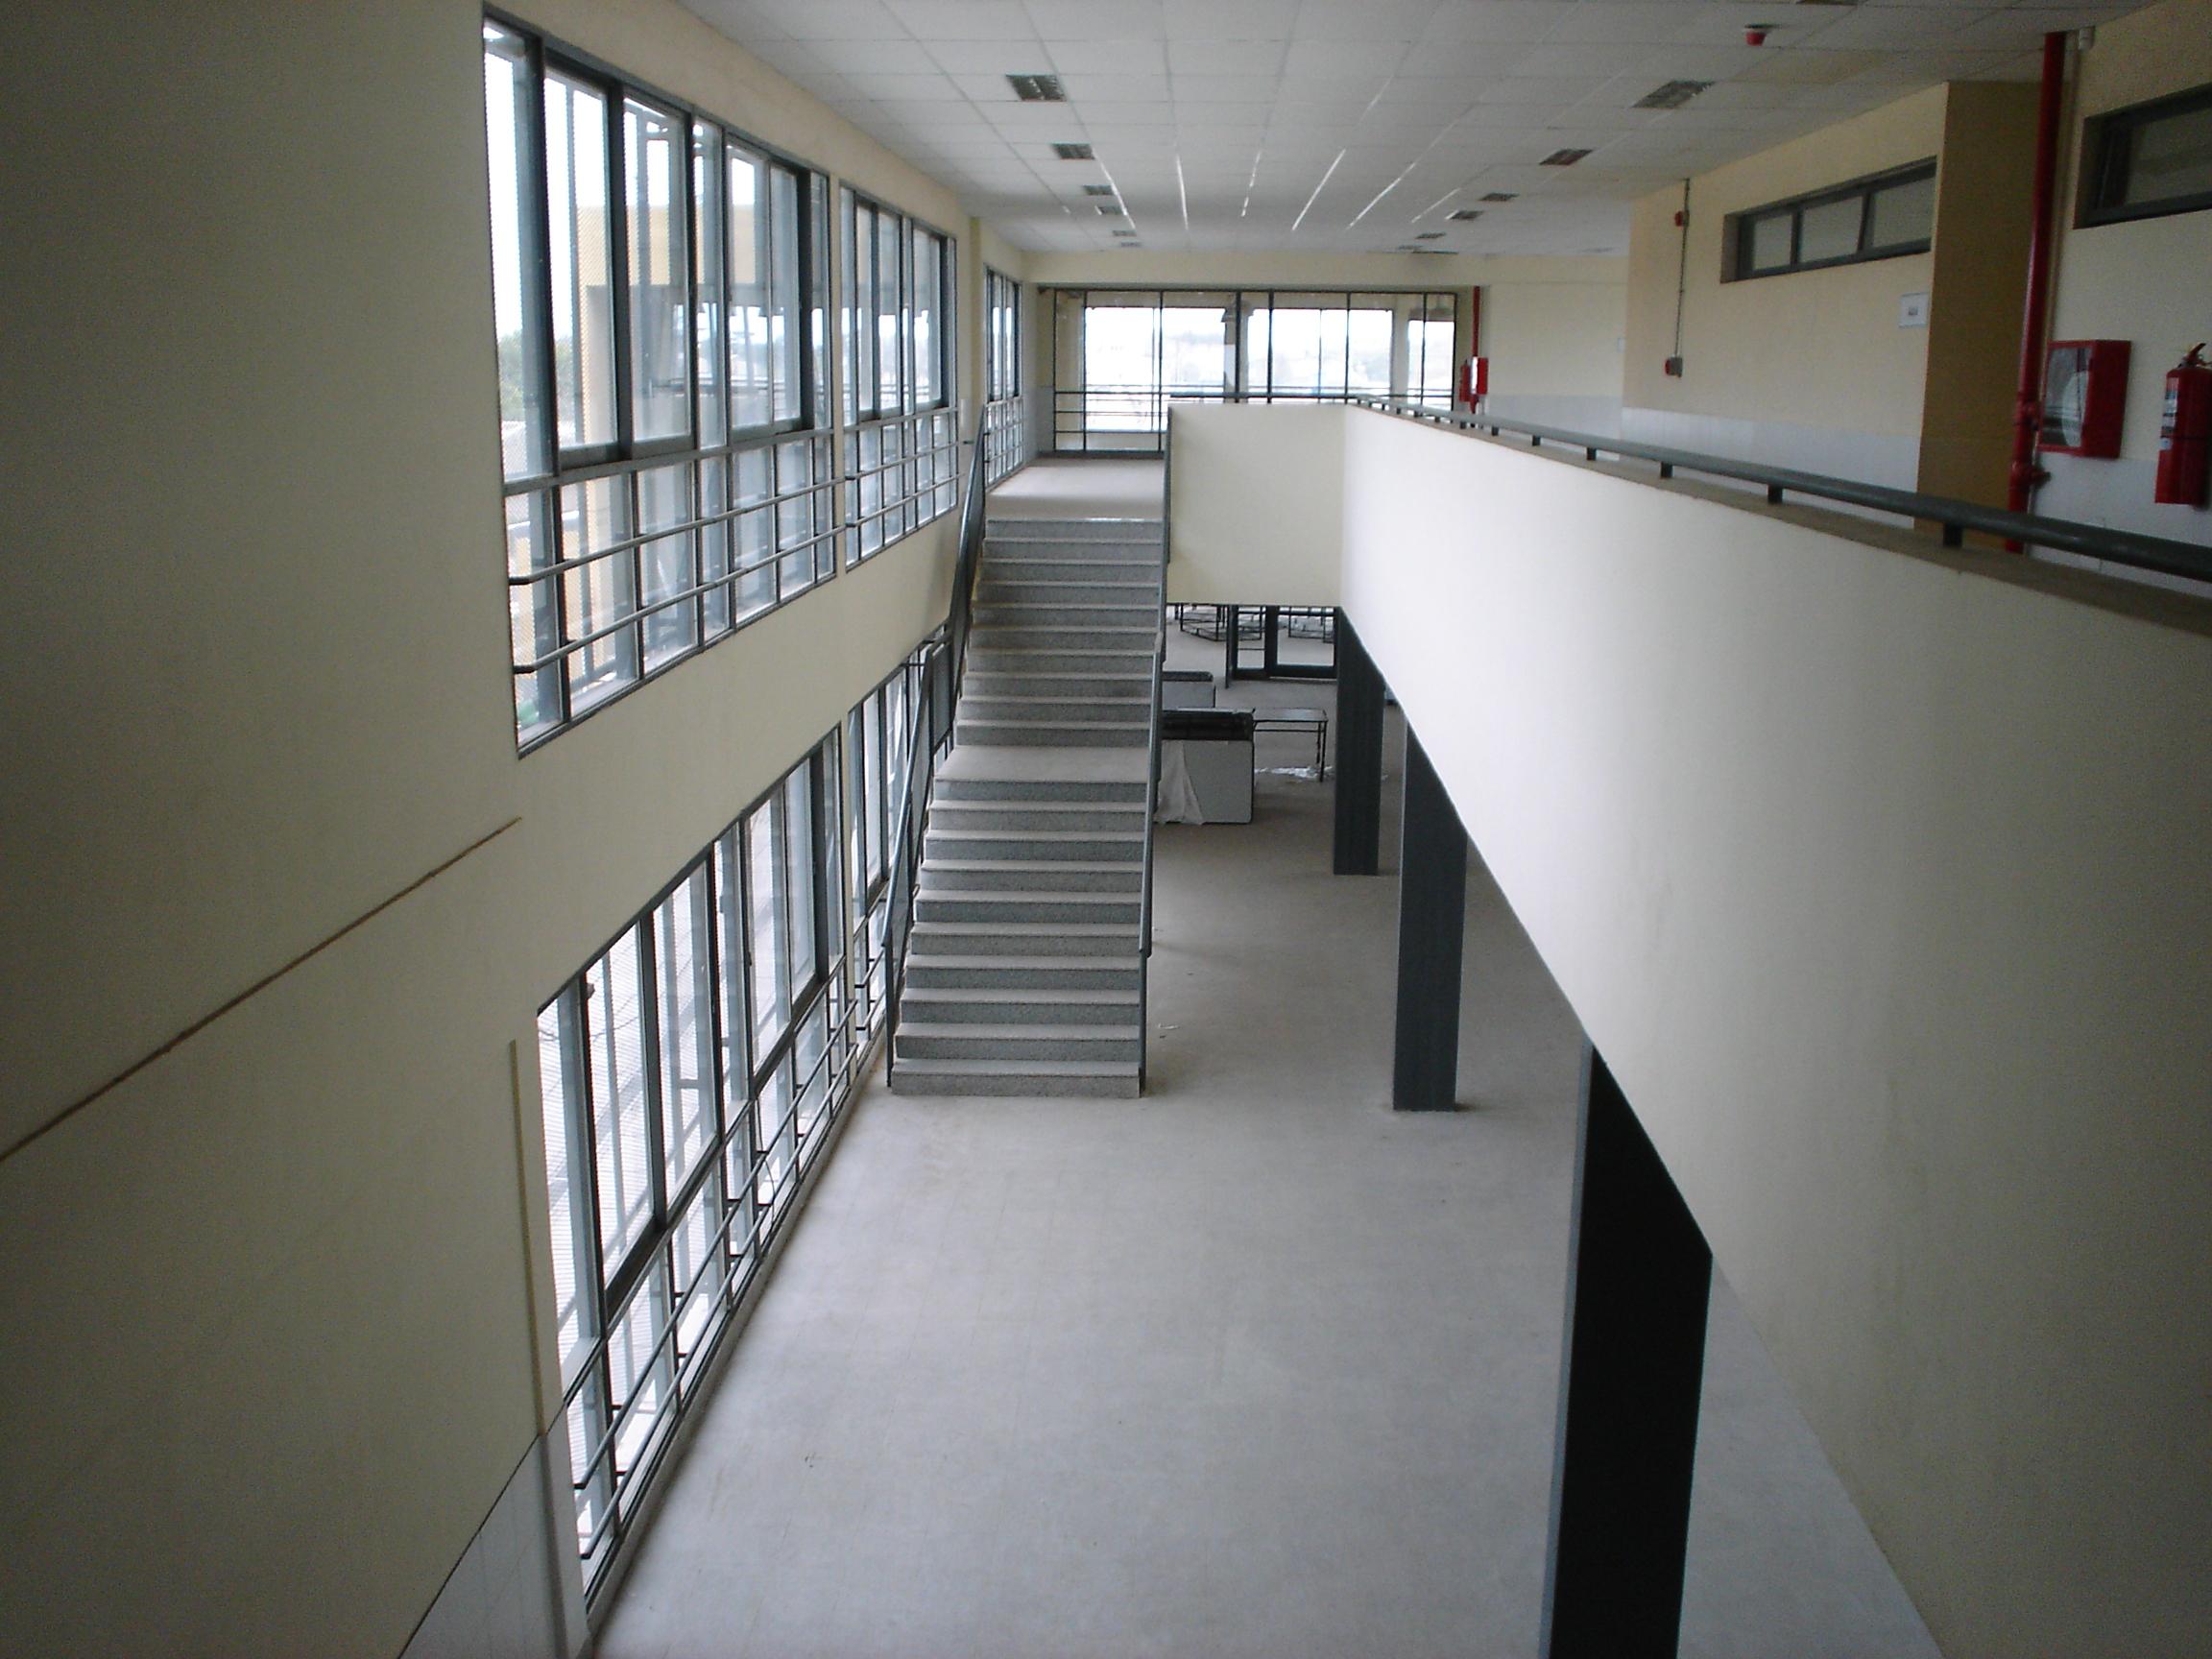 Escuela EP Nº 11 Distrito de San Nicolás